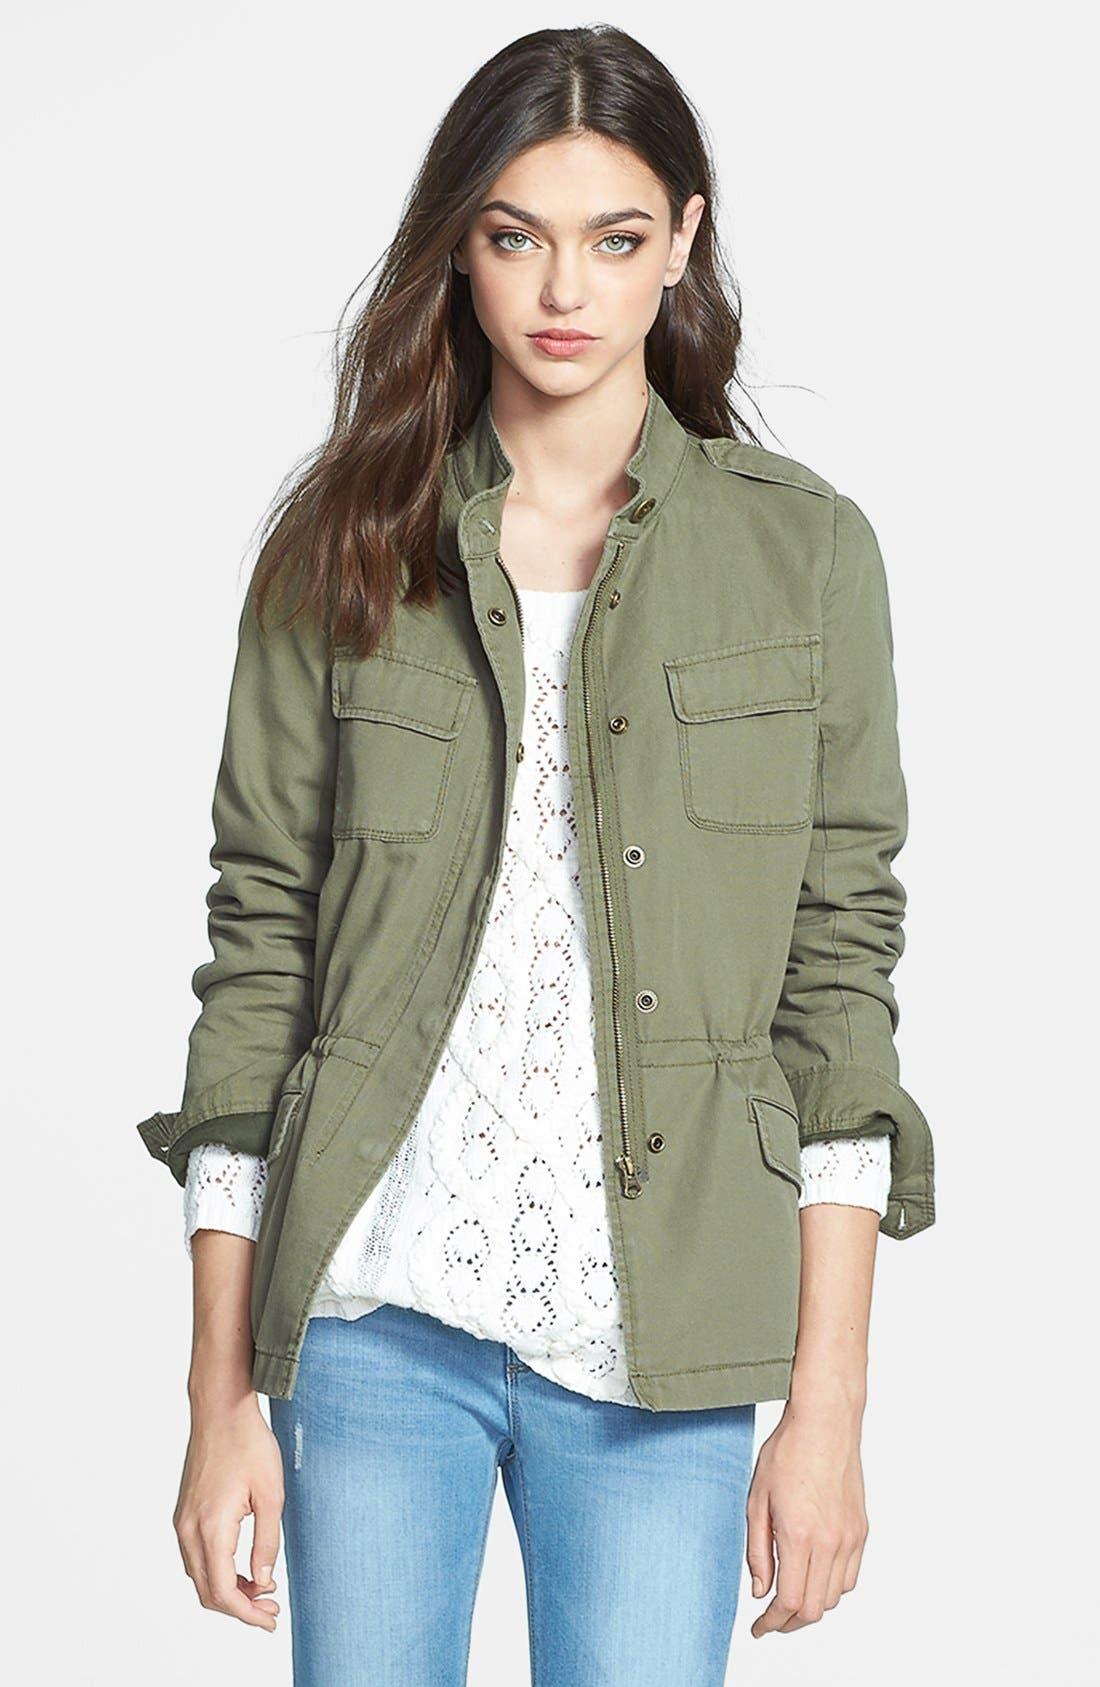 Alternate Image 1 Selected - Hinge® 'Expedition' Cotton Twill Jacket